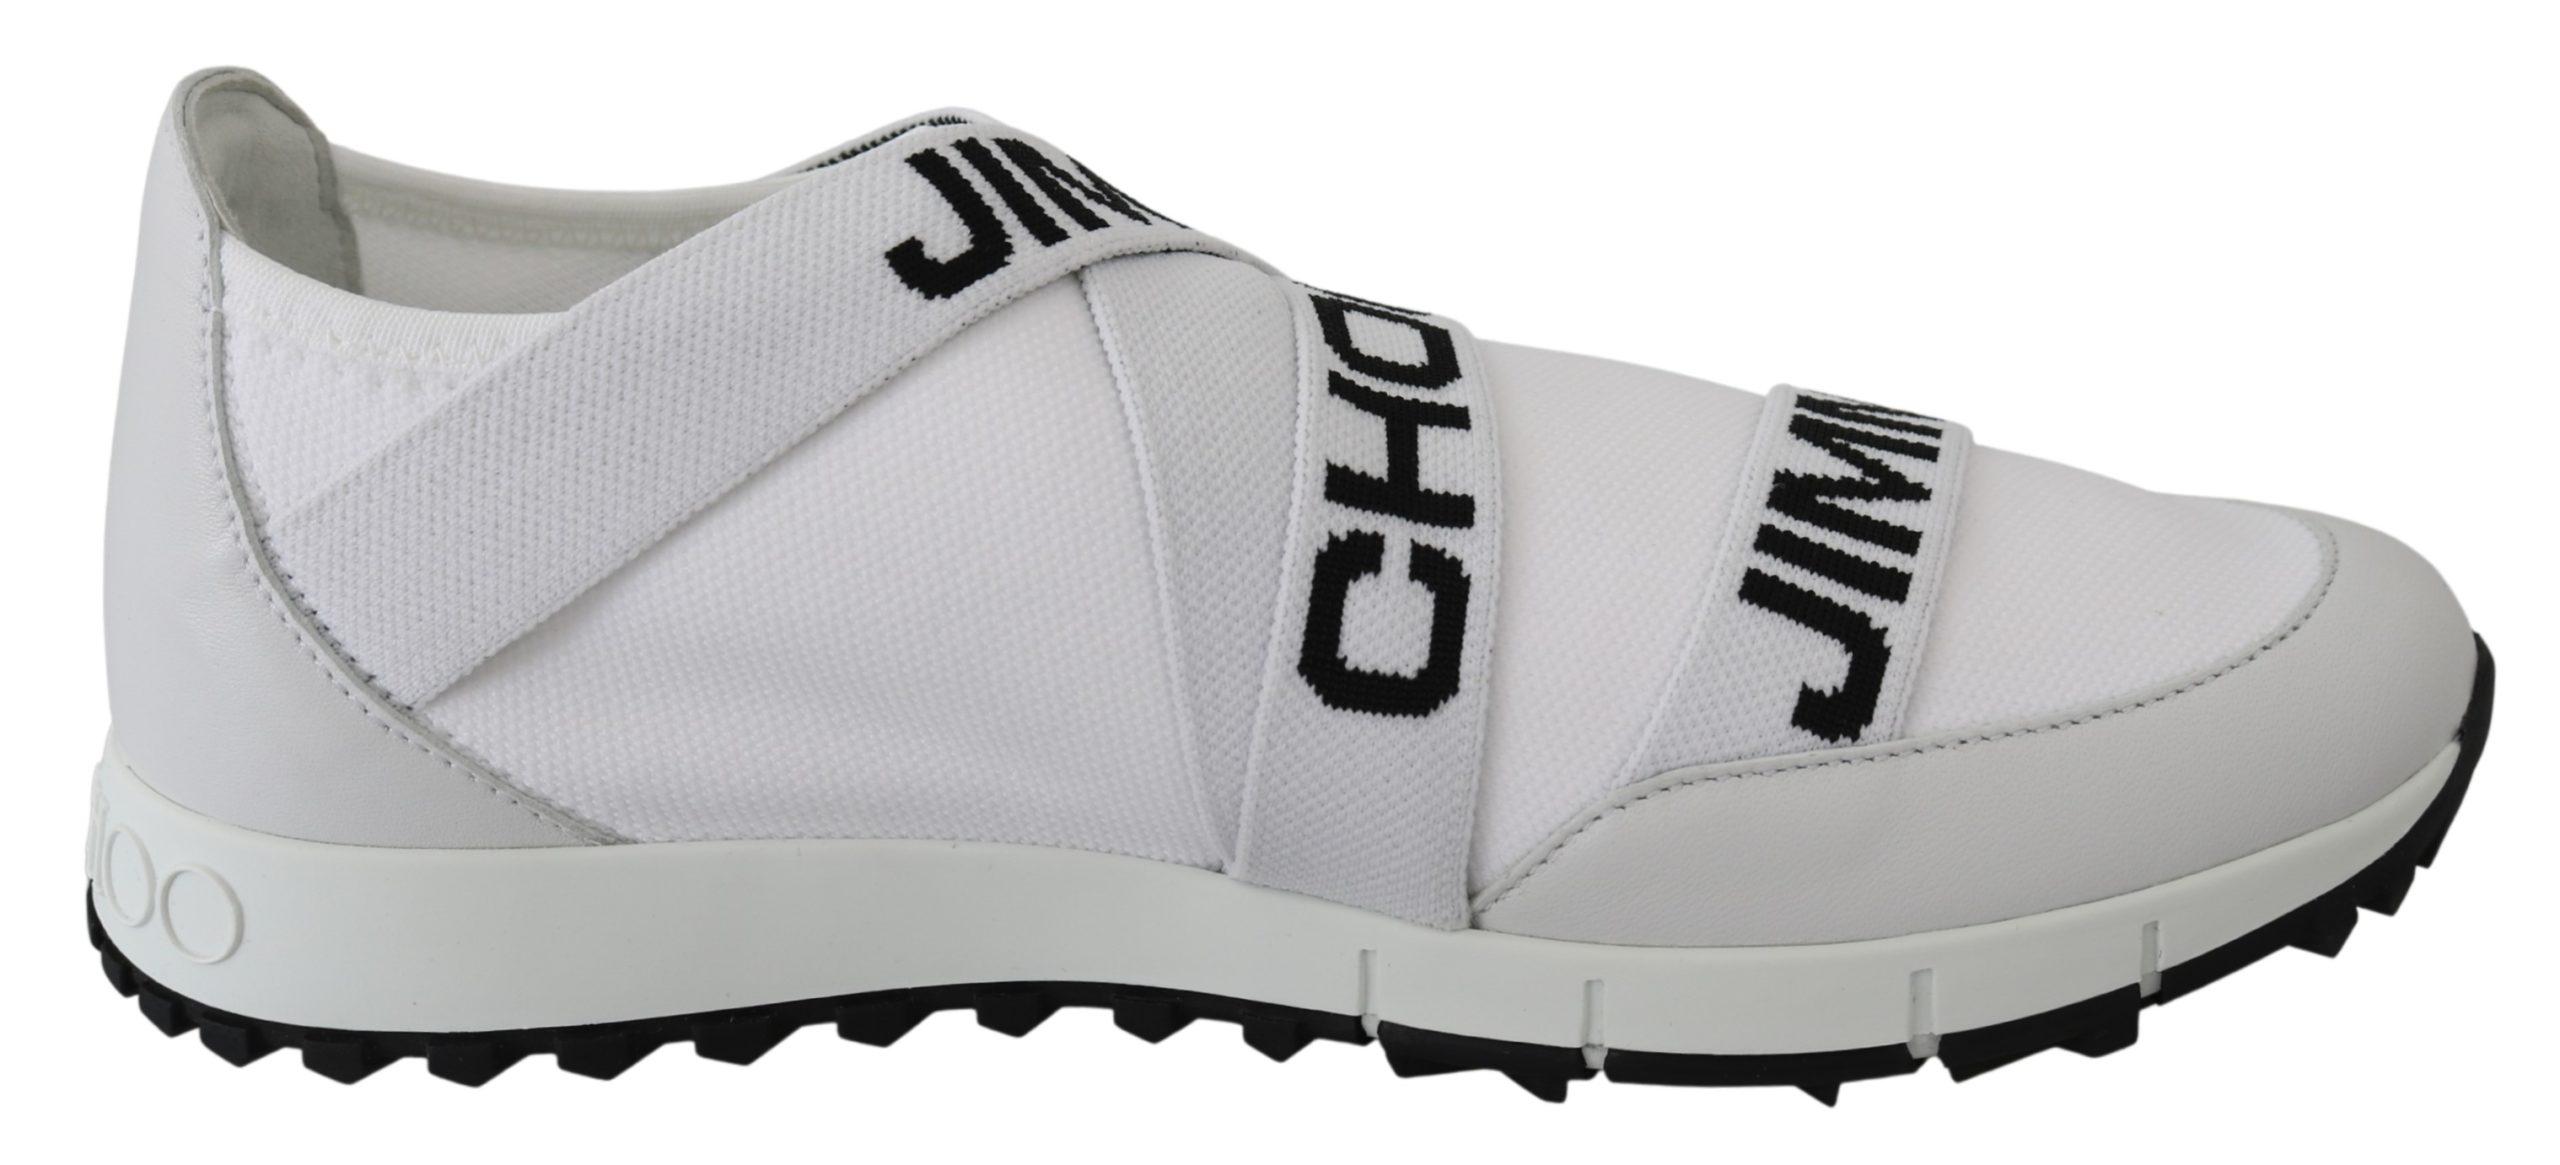 Jimmy Choo Women's Toronto Sneakers White/Black 191714815391 - EU39/US9